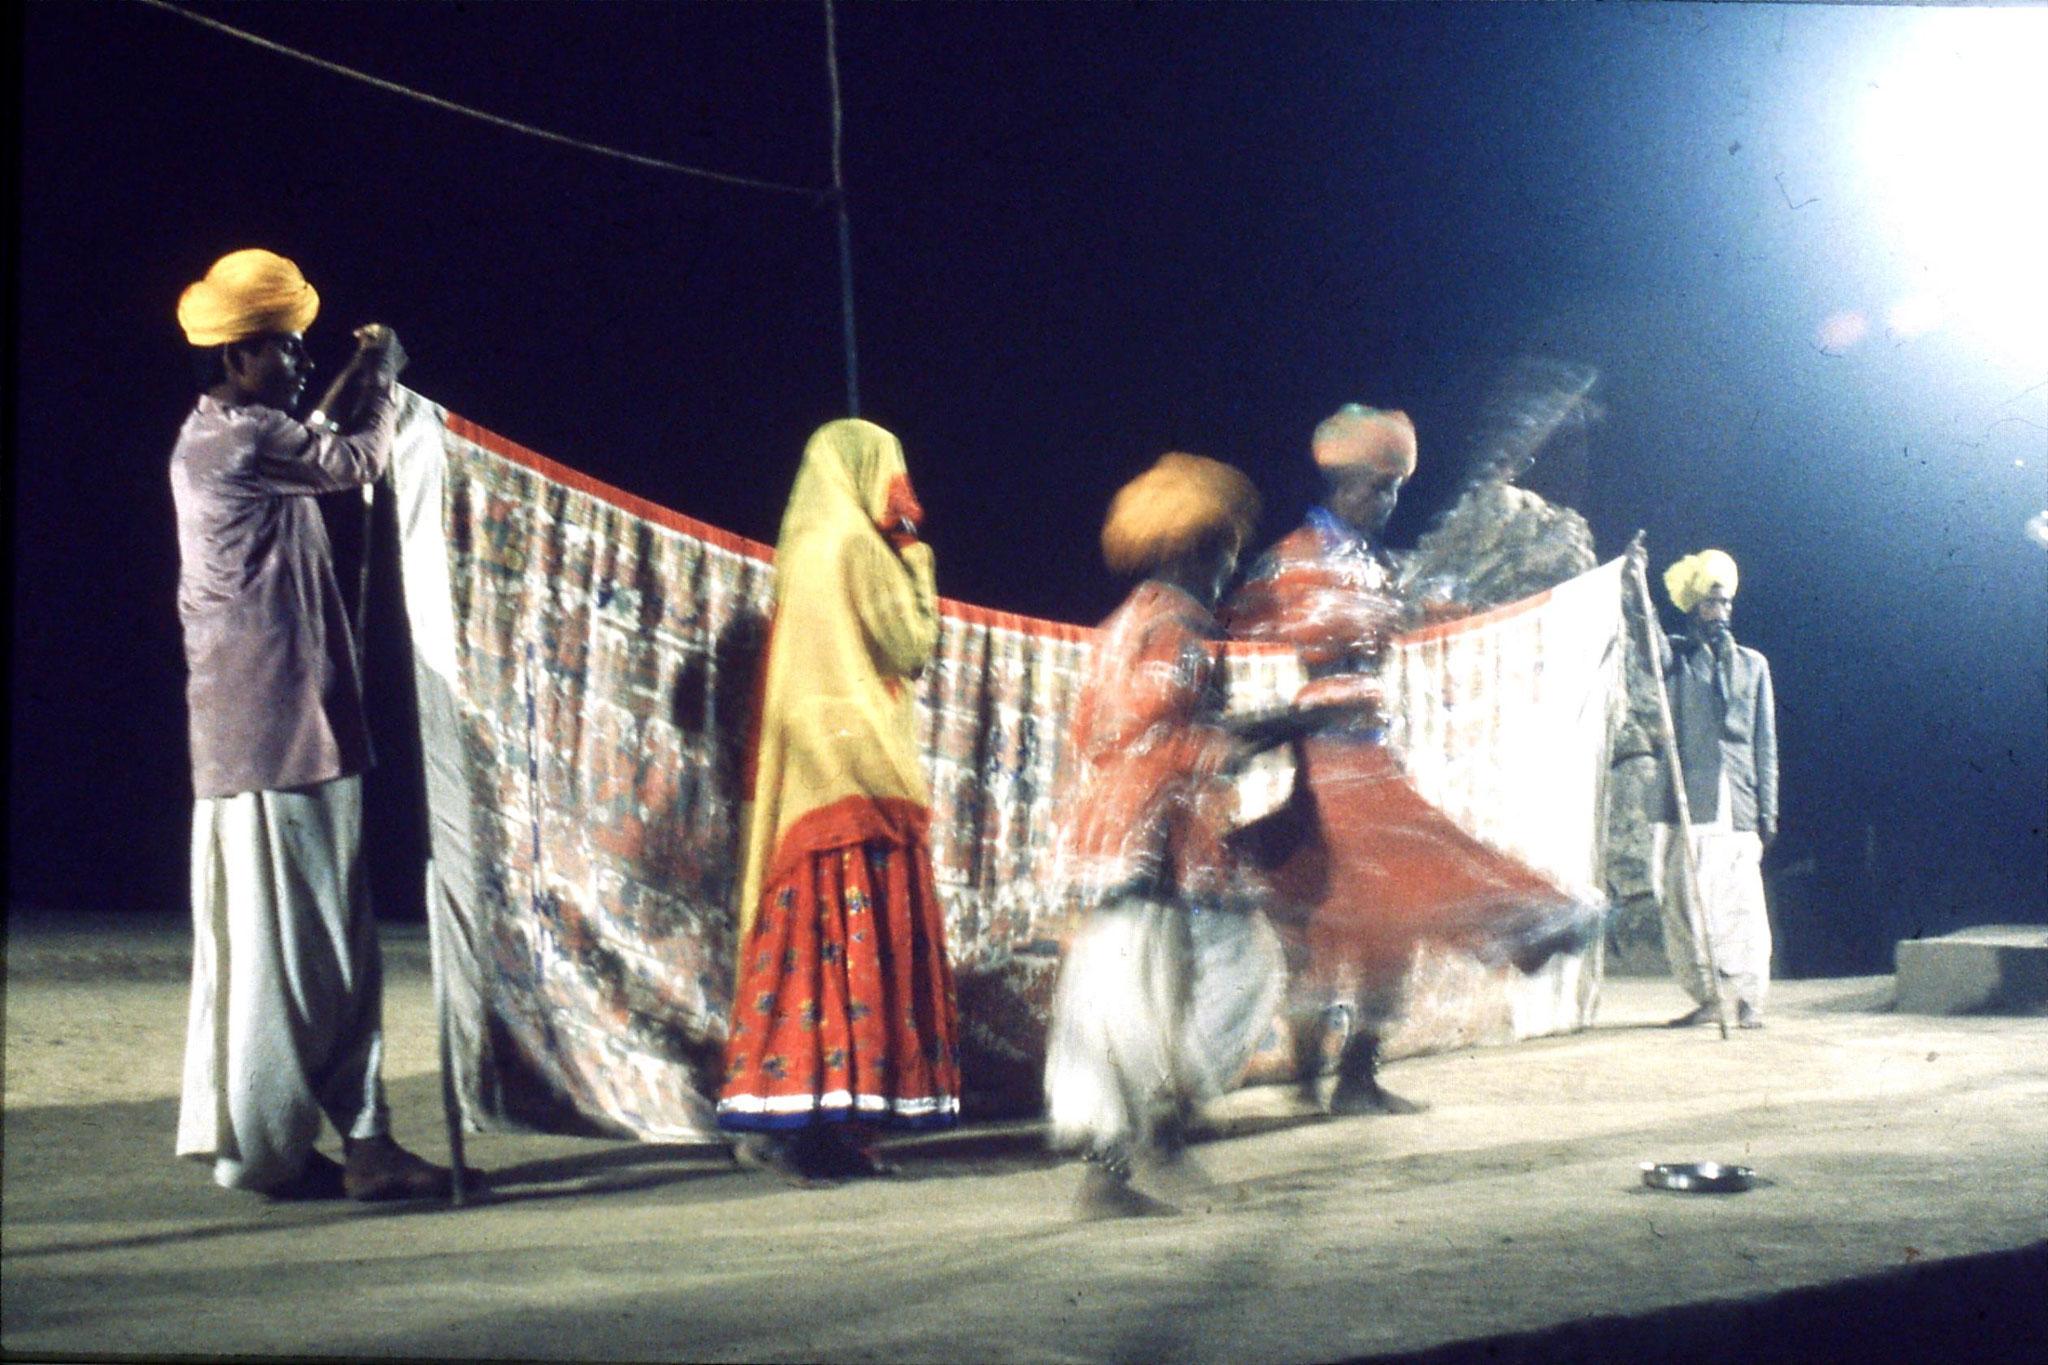 8/12/1989: 33: Udaipur Shilp Gram Craft Centre dancing